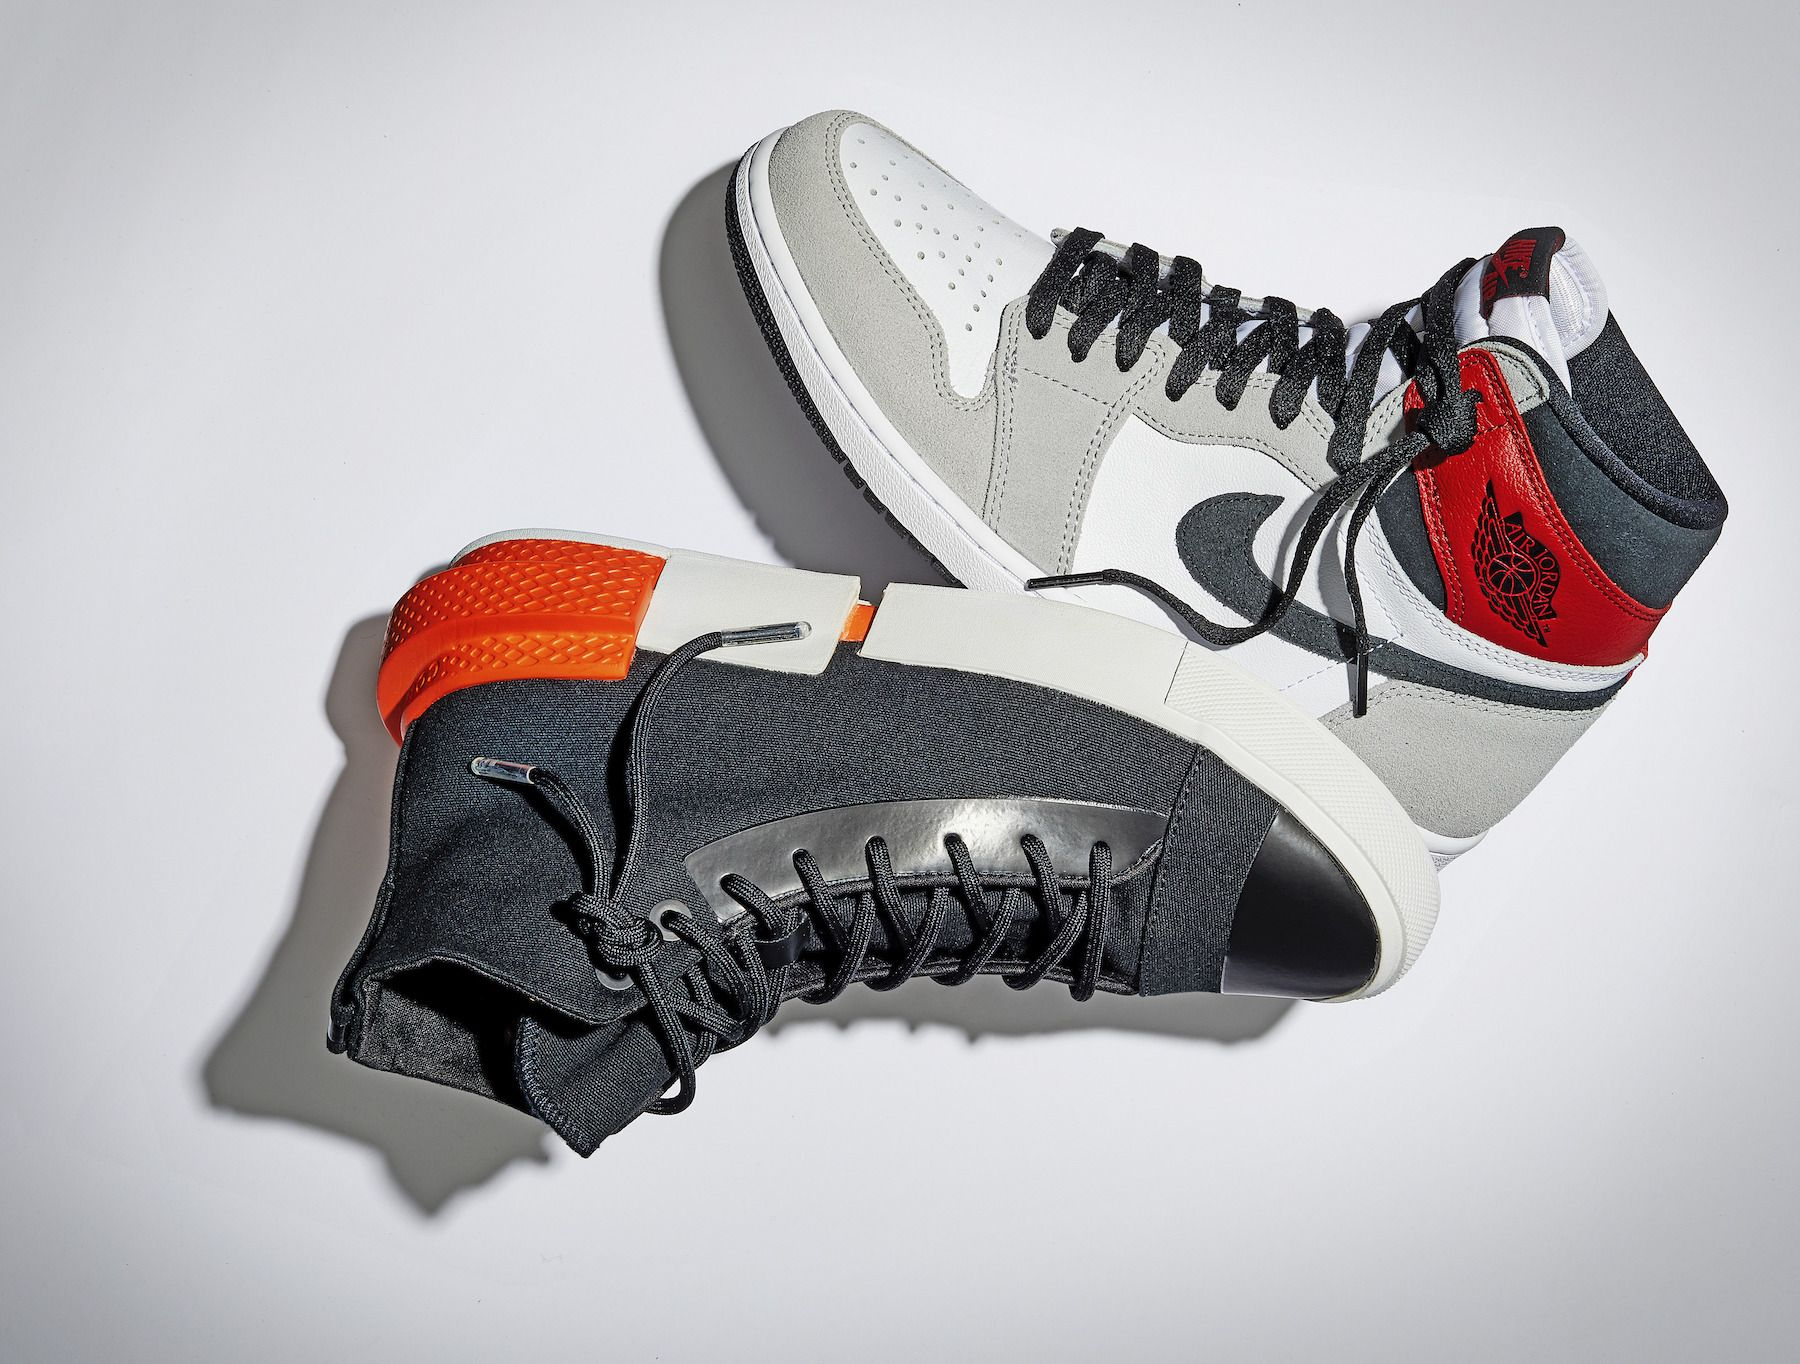 7 Best Men S Sneakers For Fall Retro Sneakers 2021